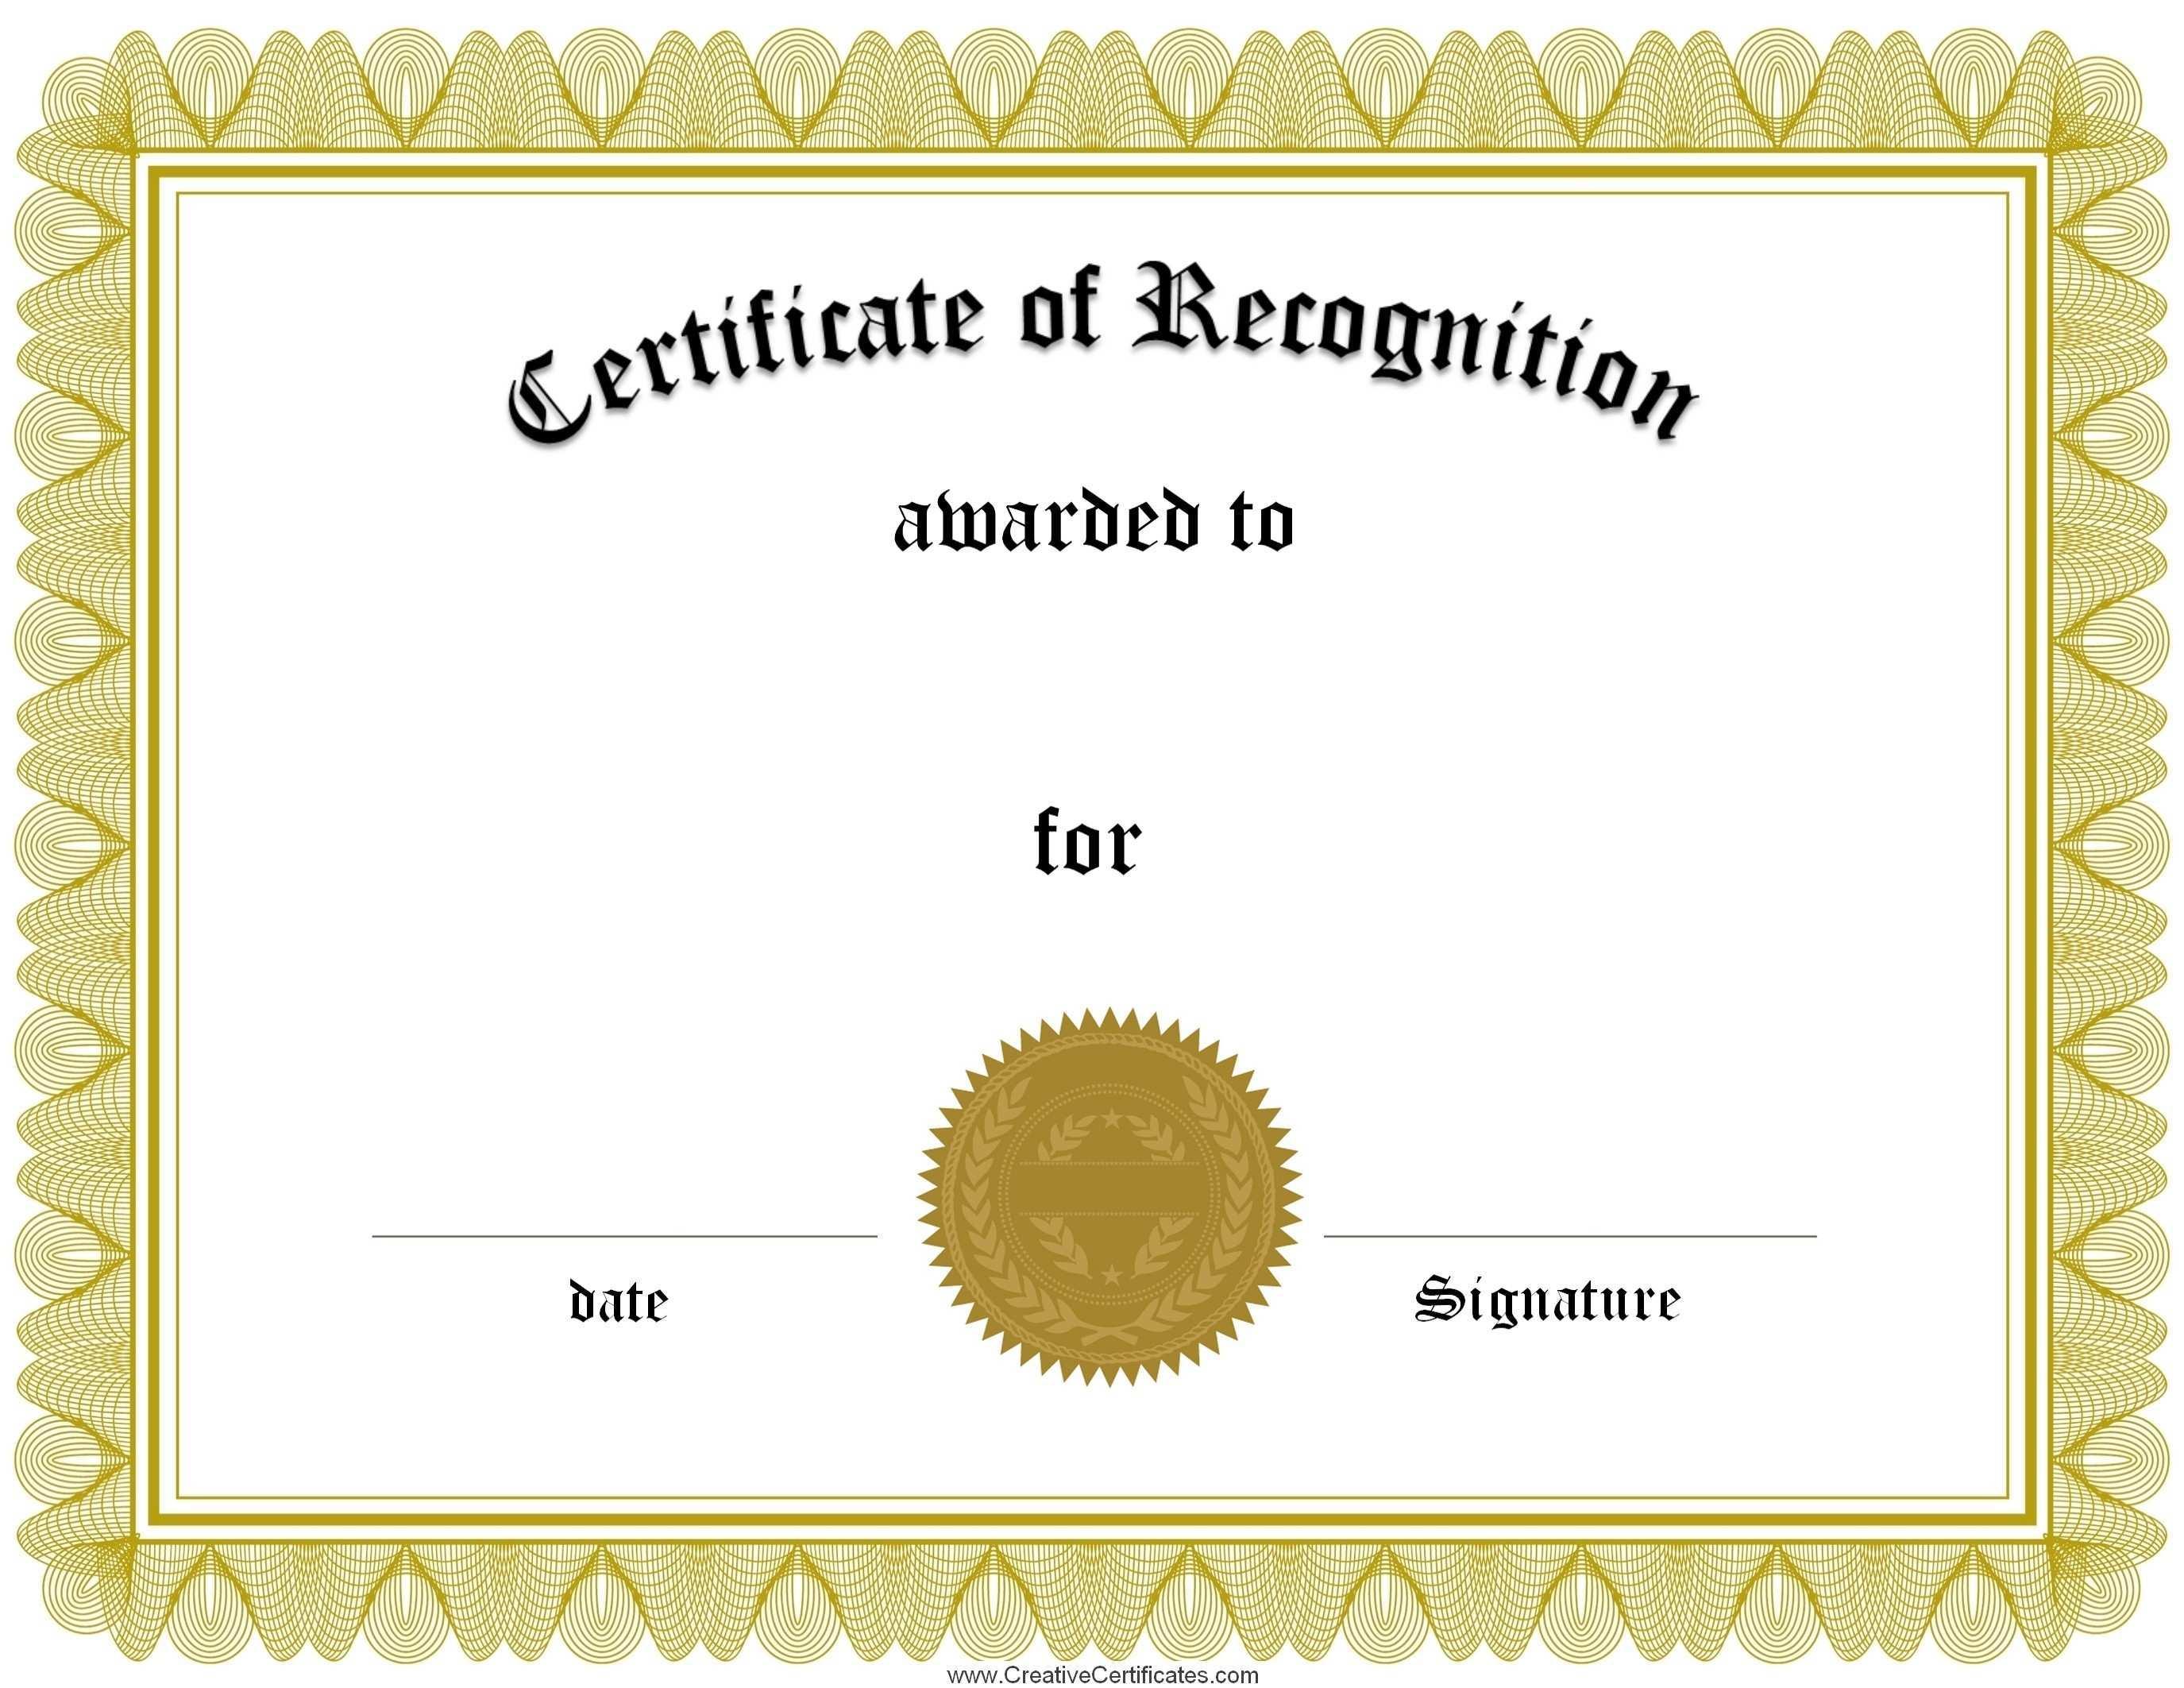 Wide Reciever Award Certificate Template Printable - 18.17 - Free Printable Award Certificates